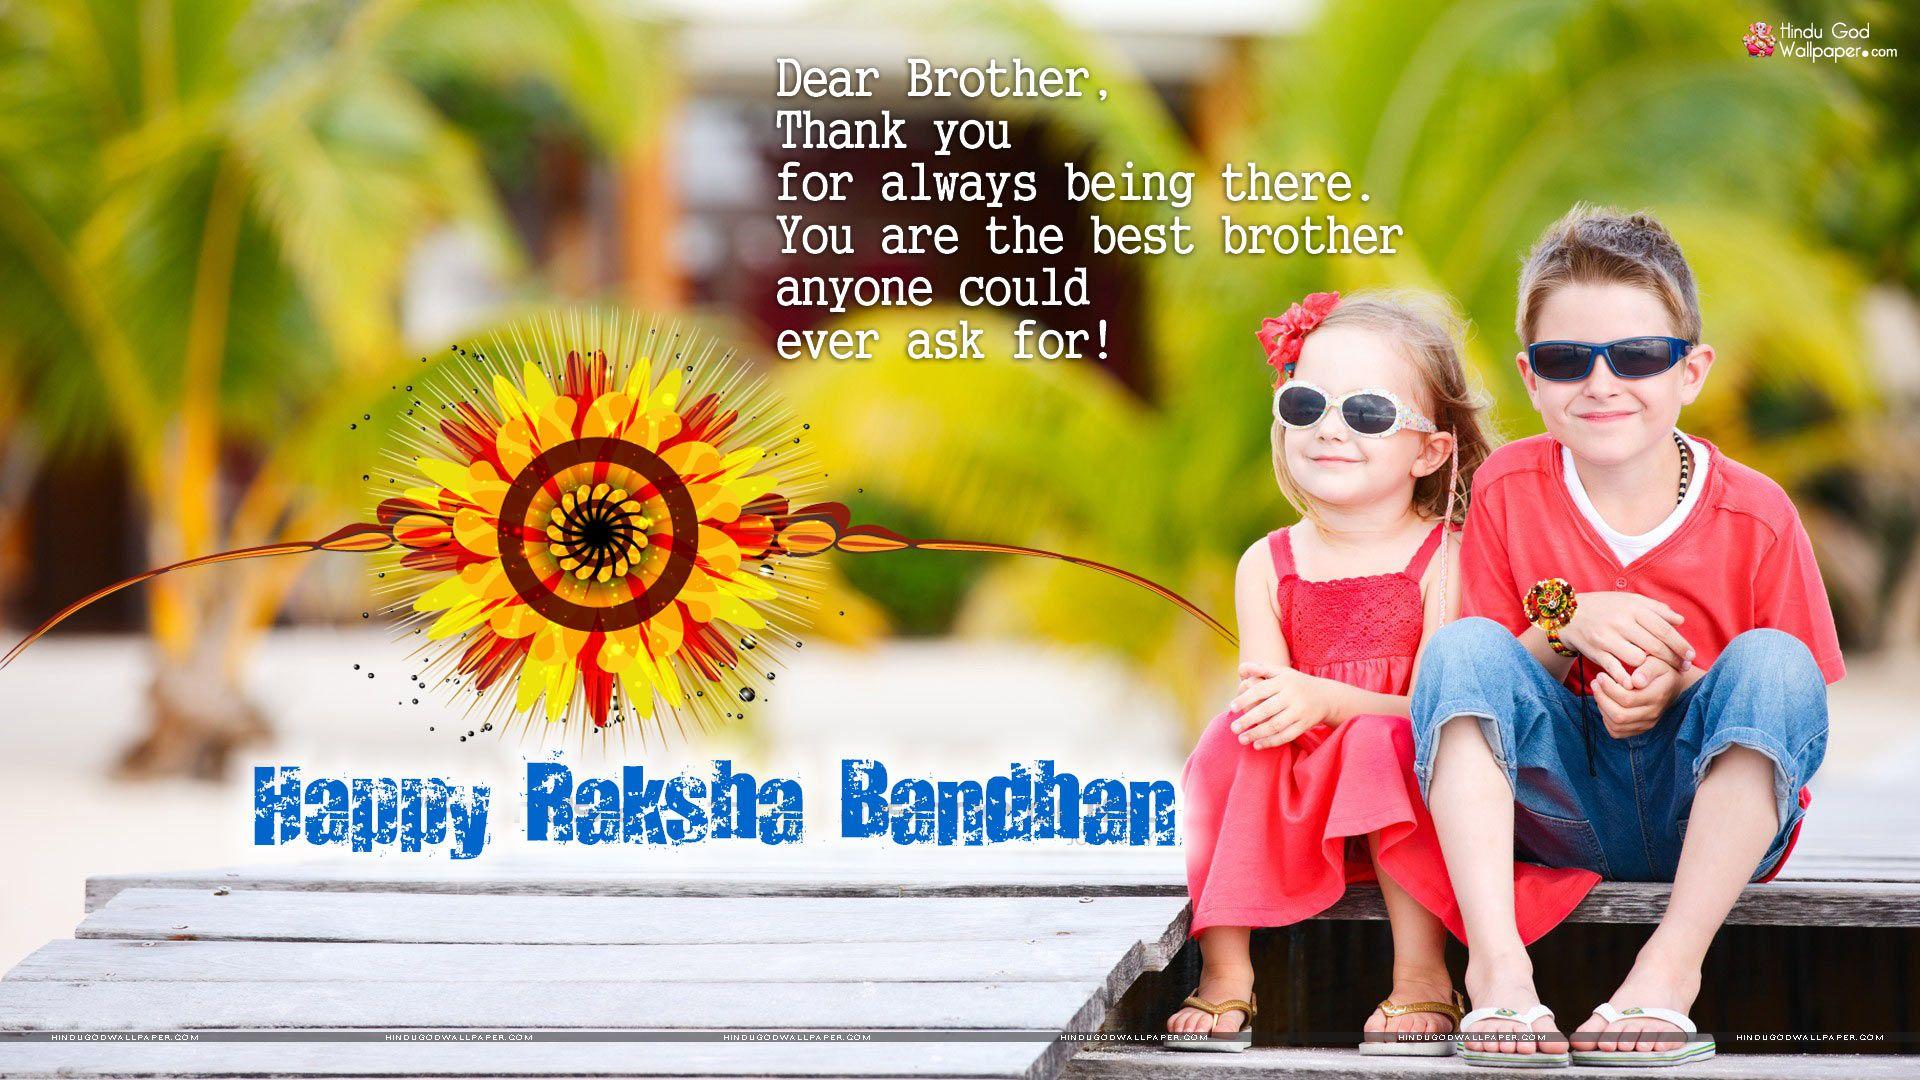 Raksha Bandhan Pictures Wallpaper for Facebook